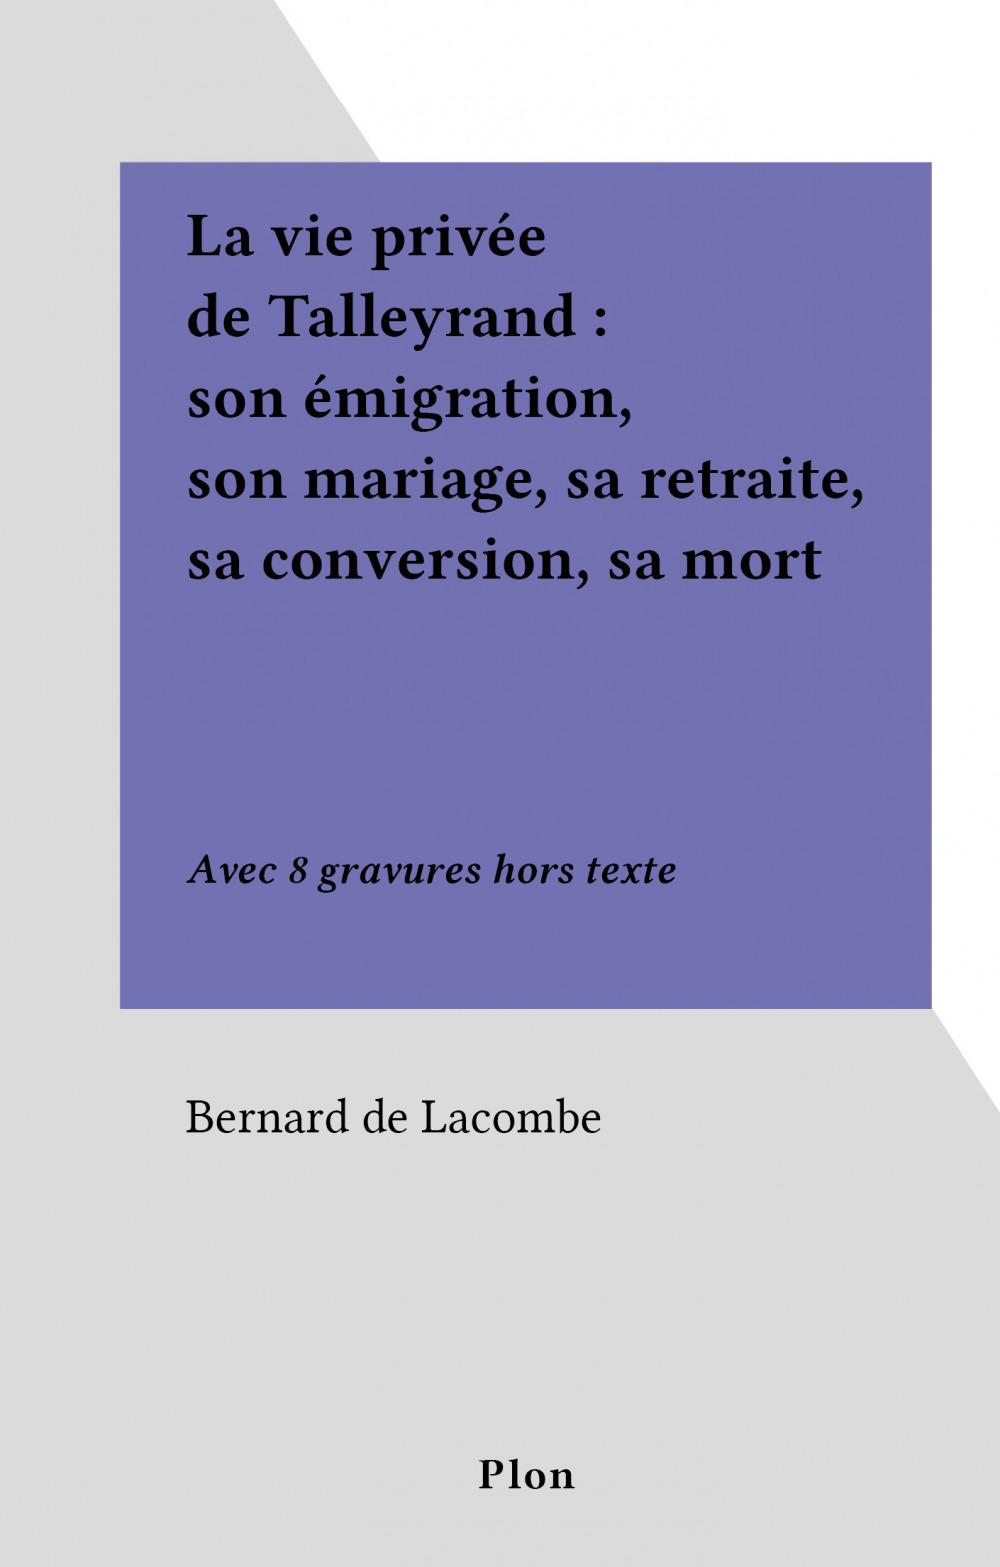 La vie privée de Talleyrand : son émigration, son mariage, sa retraite, sa conversion, sa mort  - Bernard de Lacombe